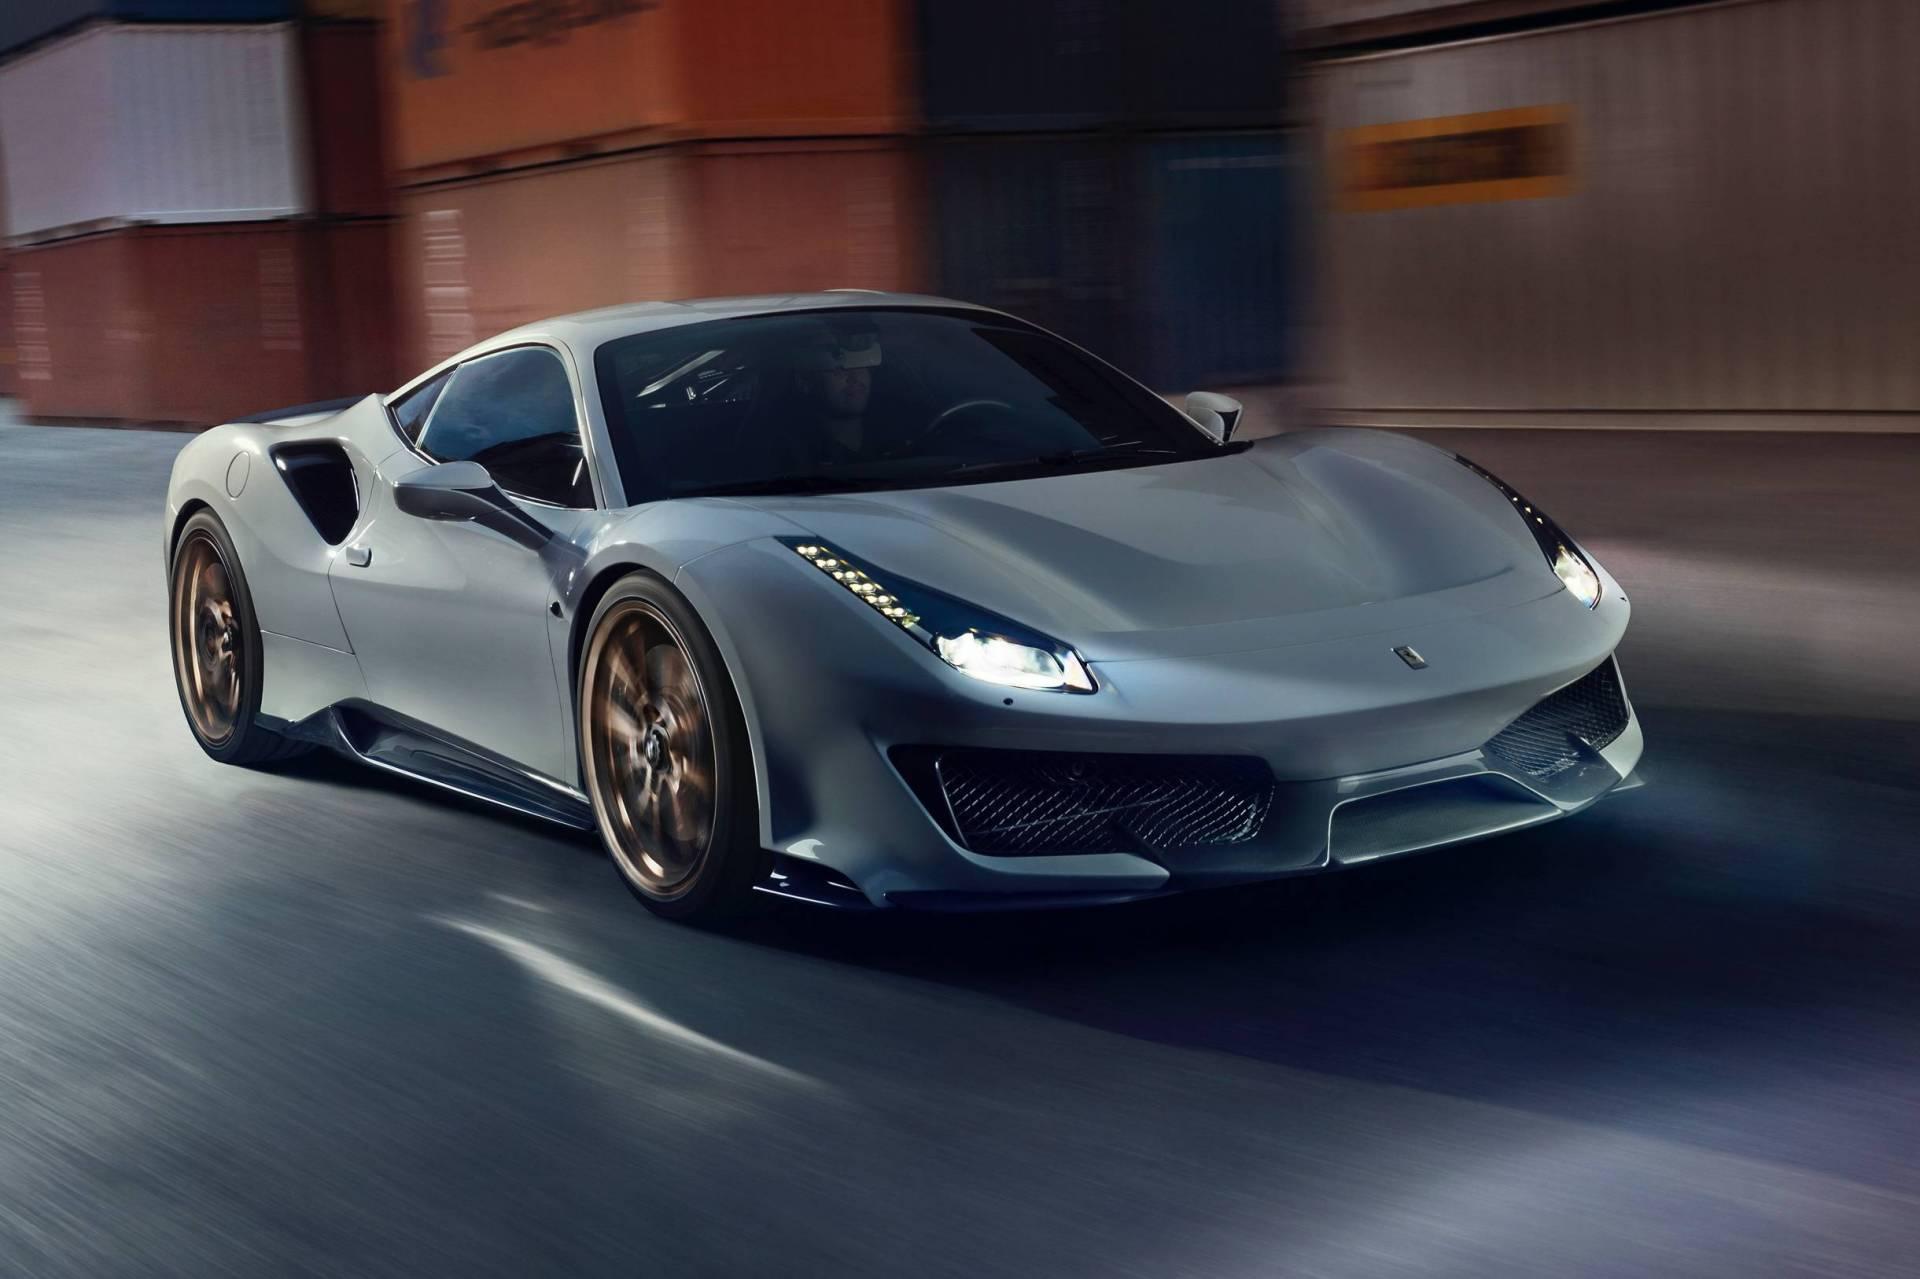 Ferrari-488-Pista-by-Novitec-1